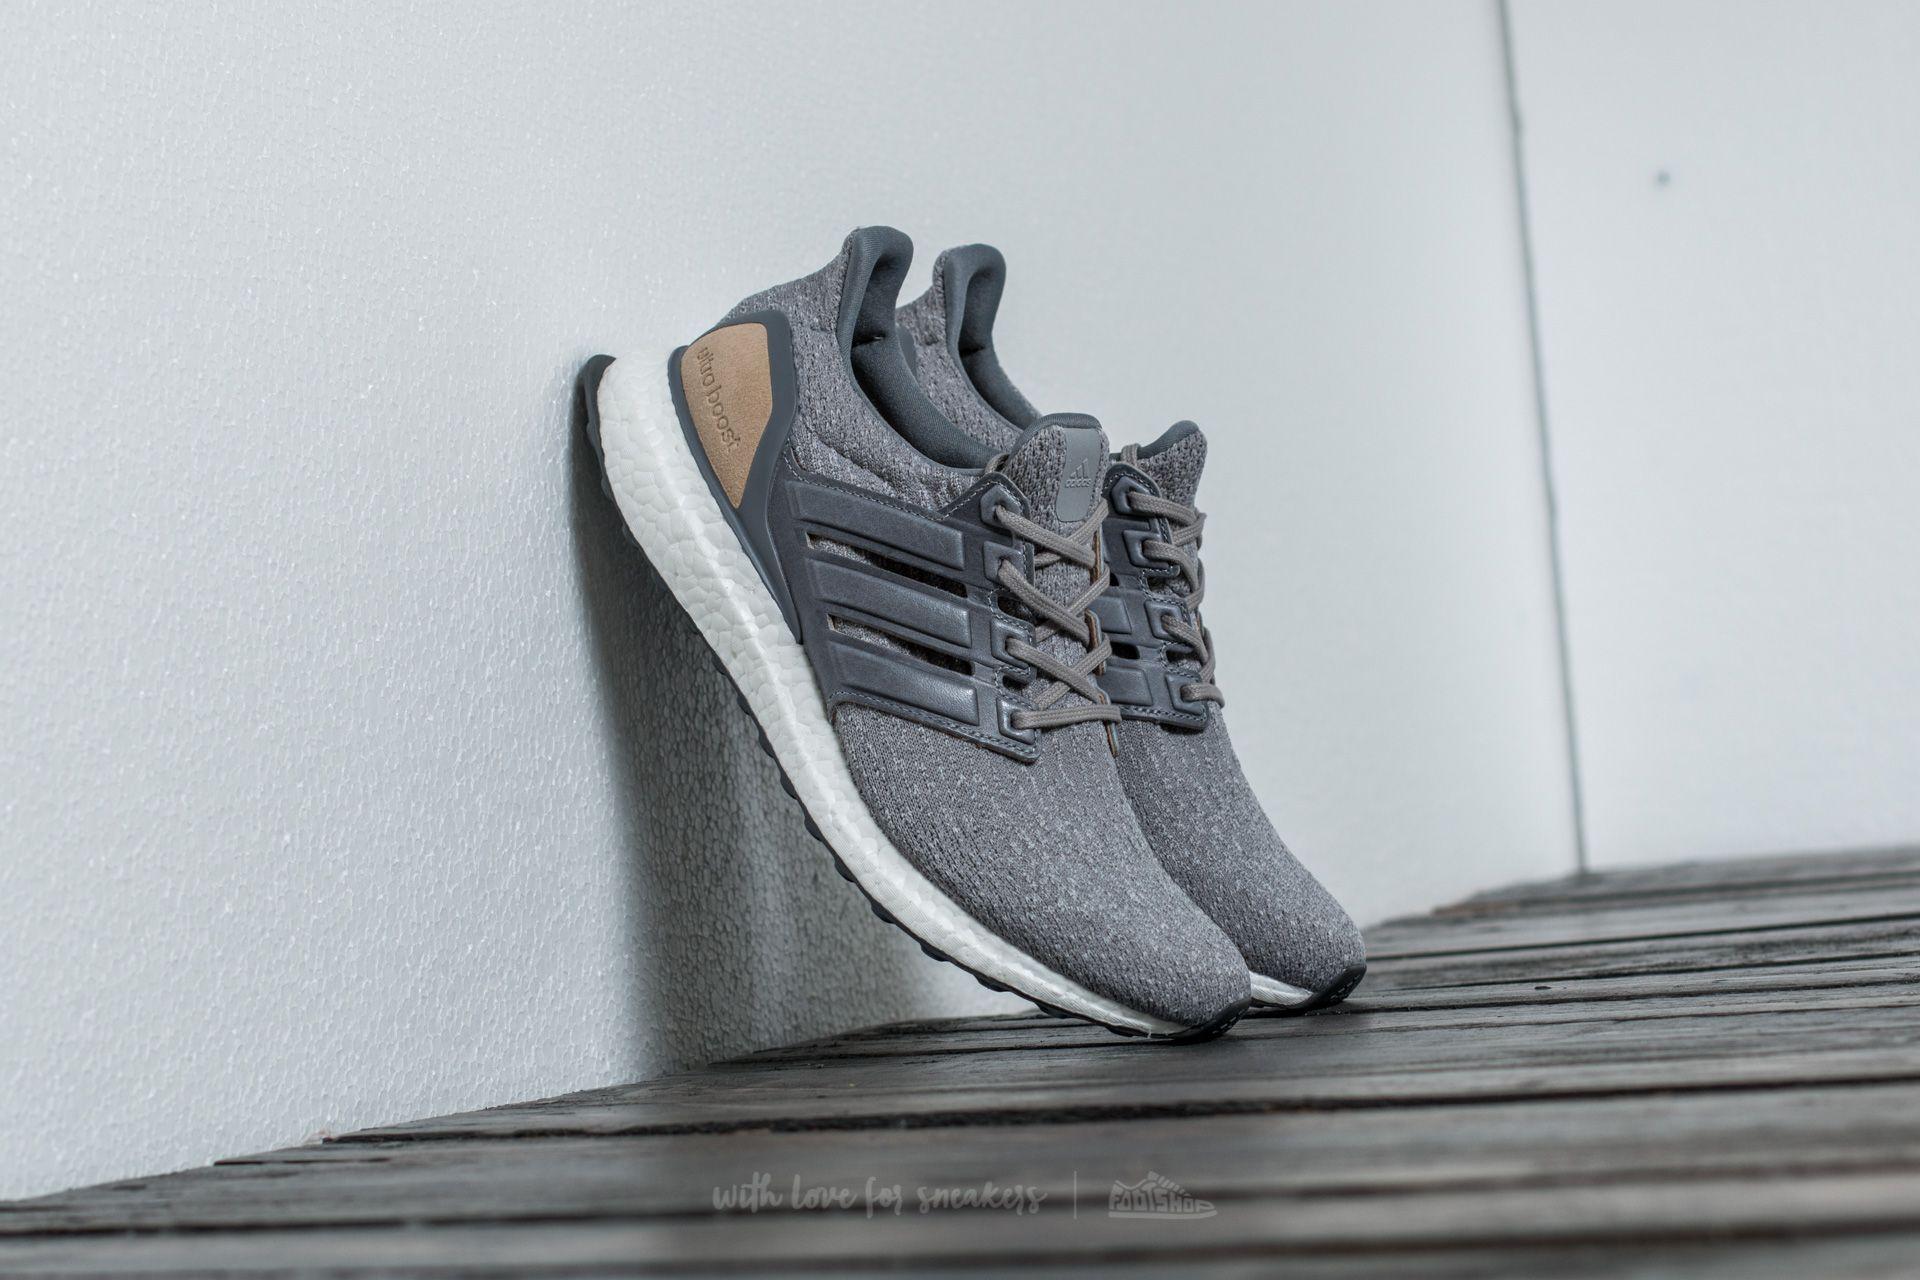 adidas Ultra Boost LTD Mid Grey/ Linen Khaki - 15457